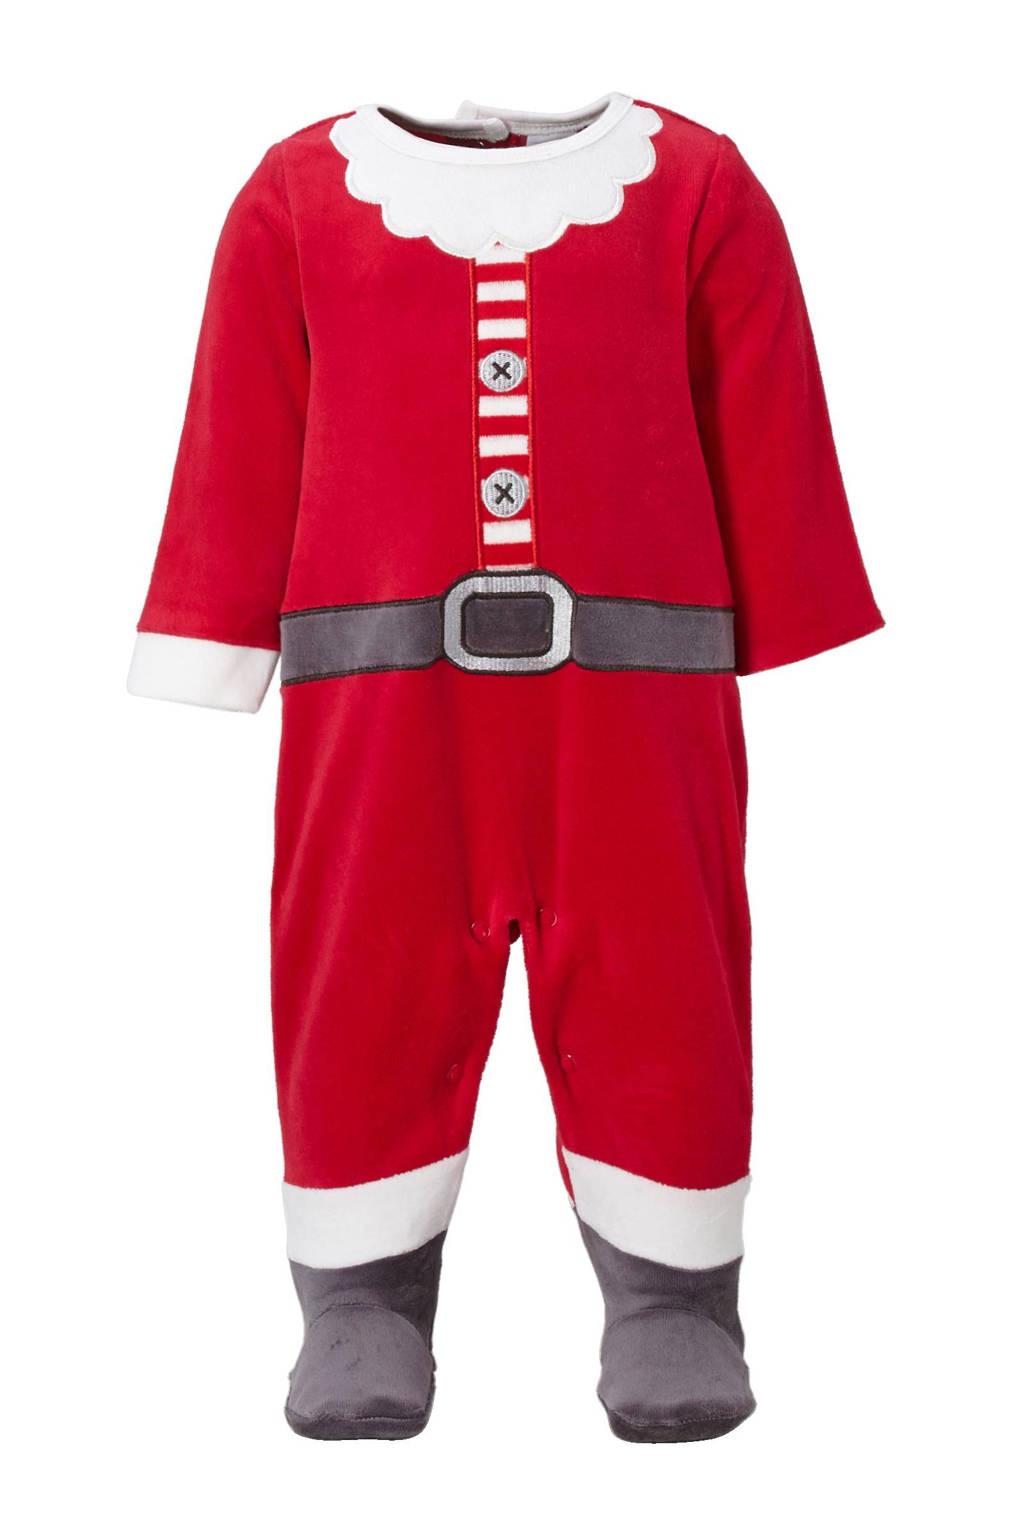 Babykleding Voor Kerst.C A Baby Club Kerst Boxpak Wehkamp